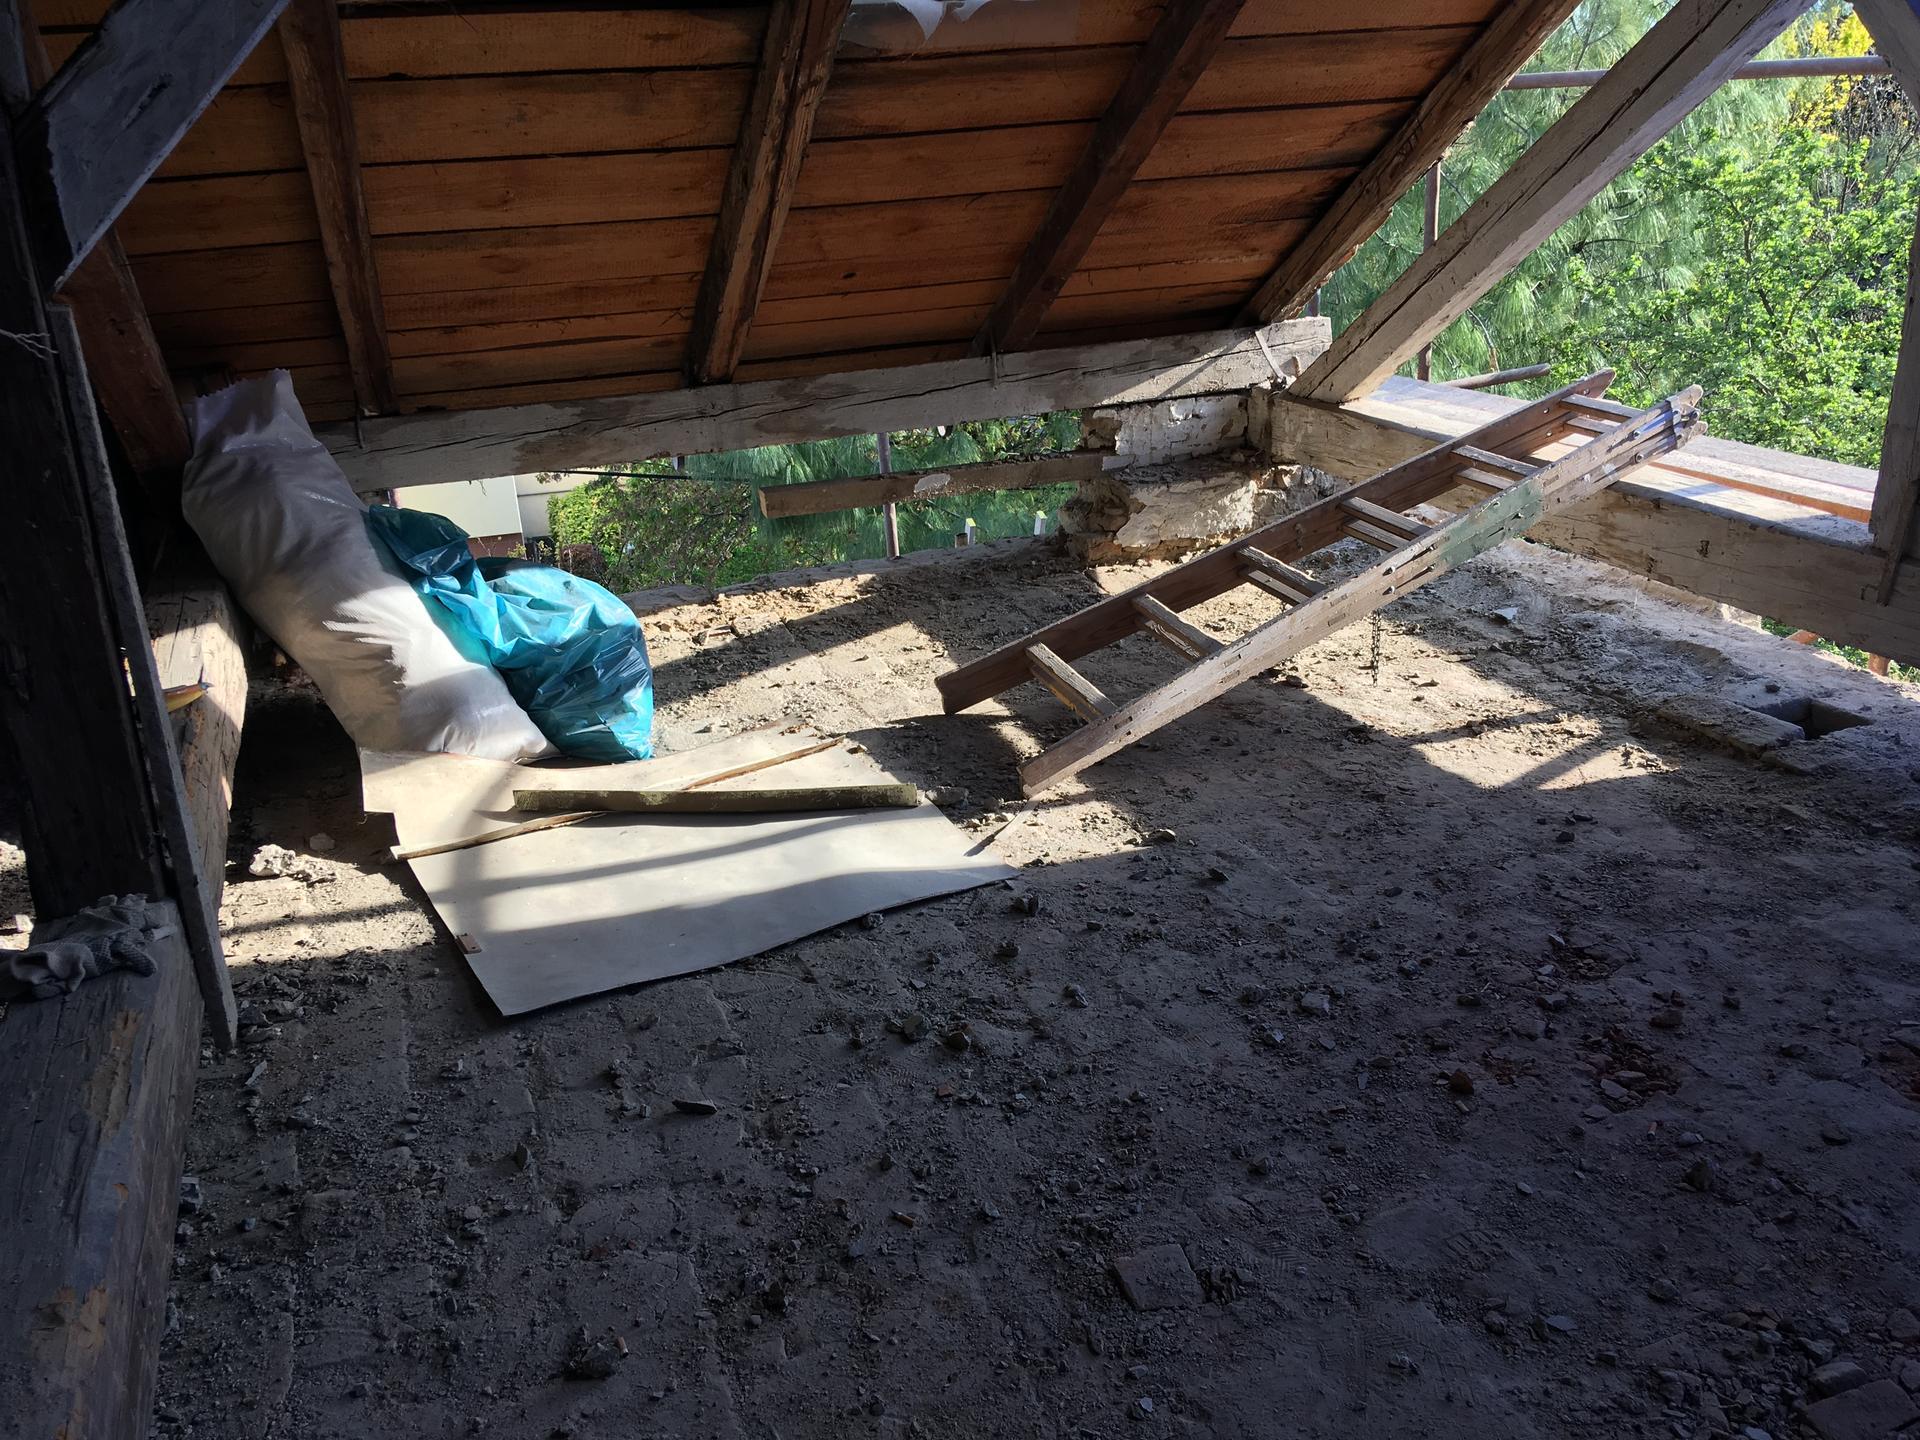 Prestavba podkrovia zo sedlovo valbovej na sedlovú strechu. - Obrázok č. 56